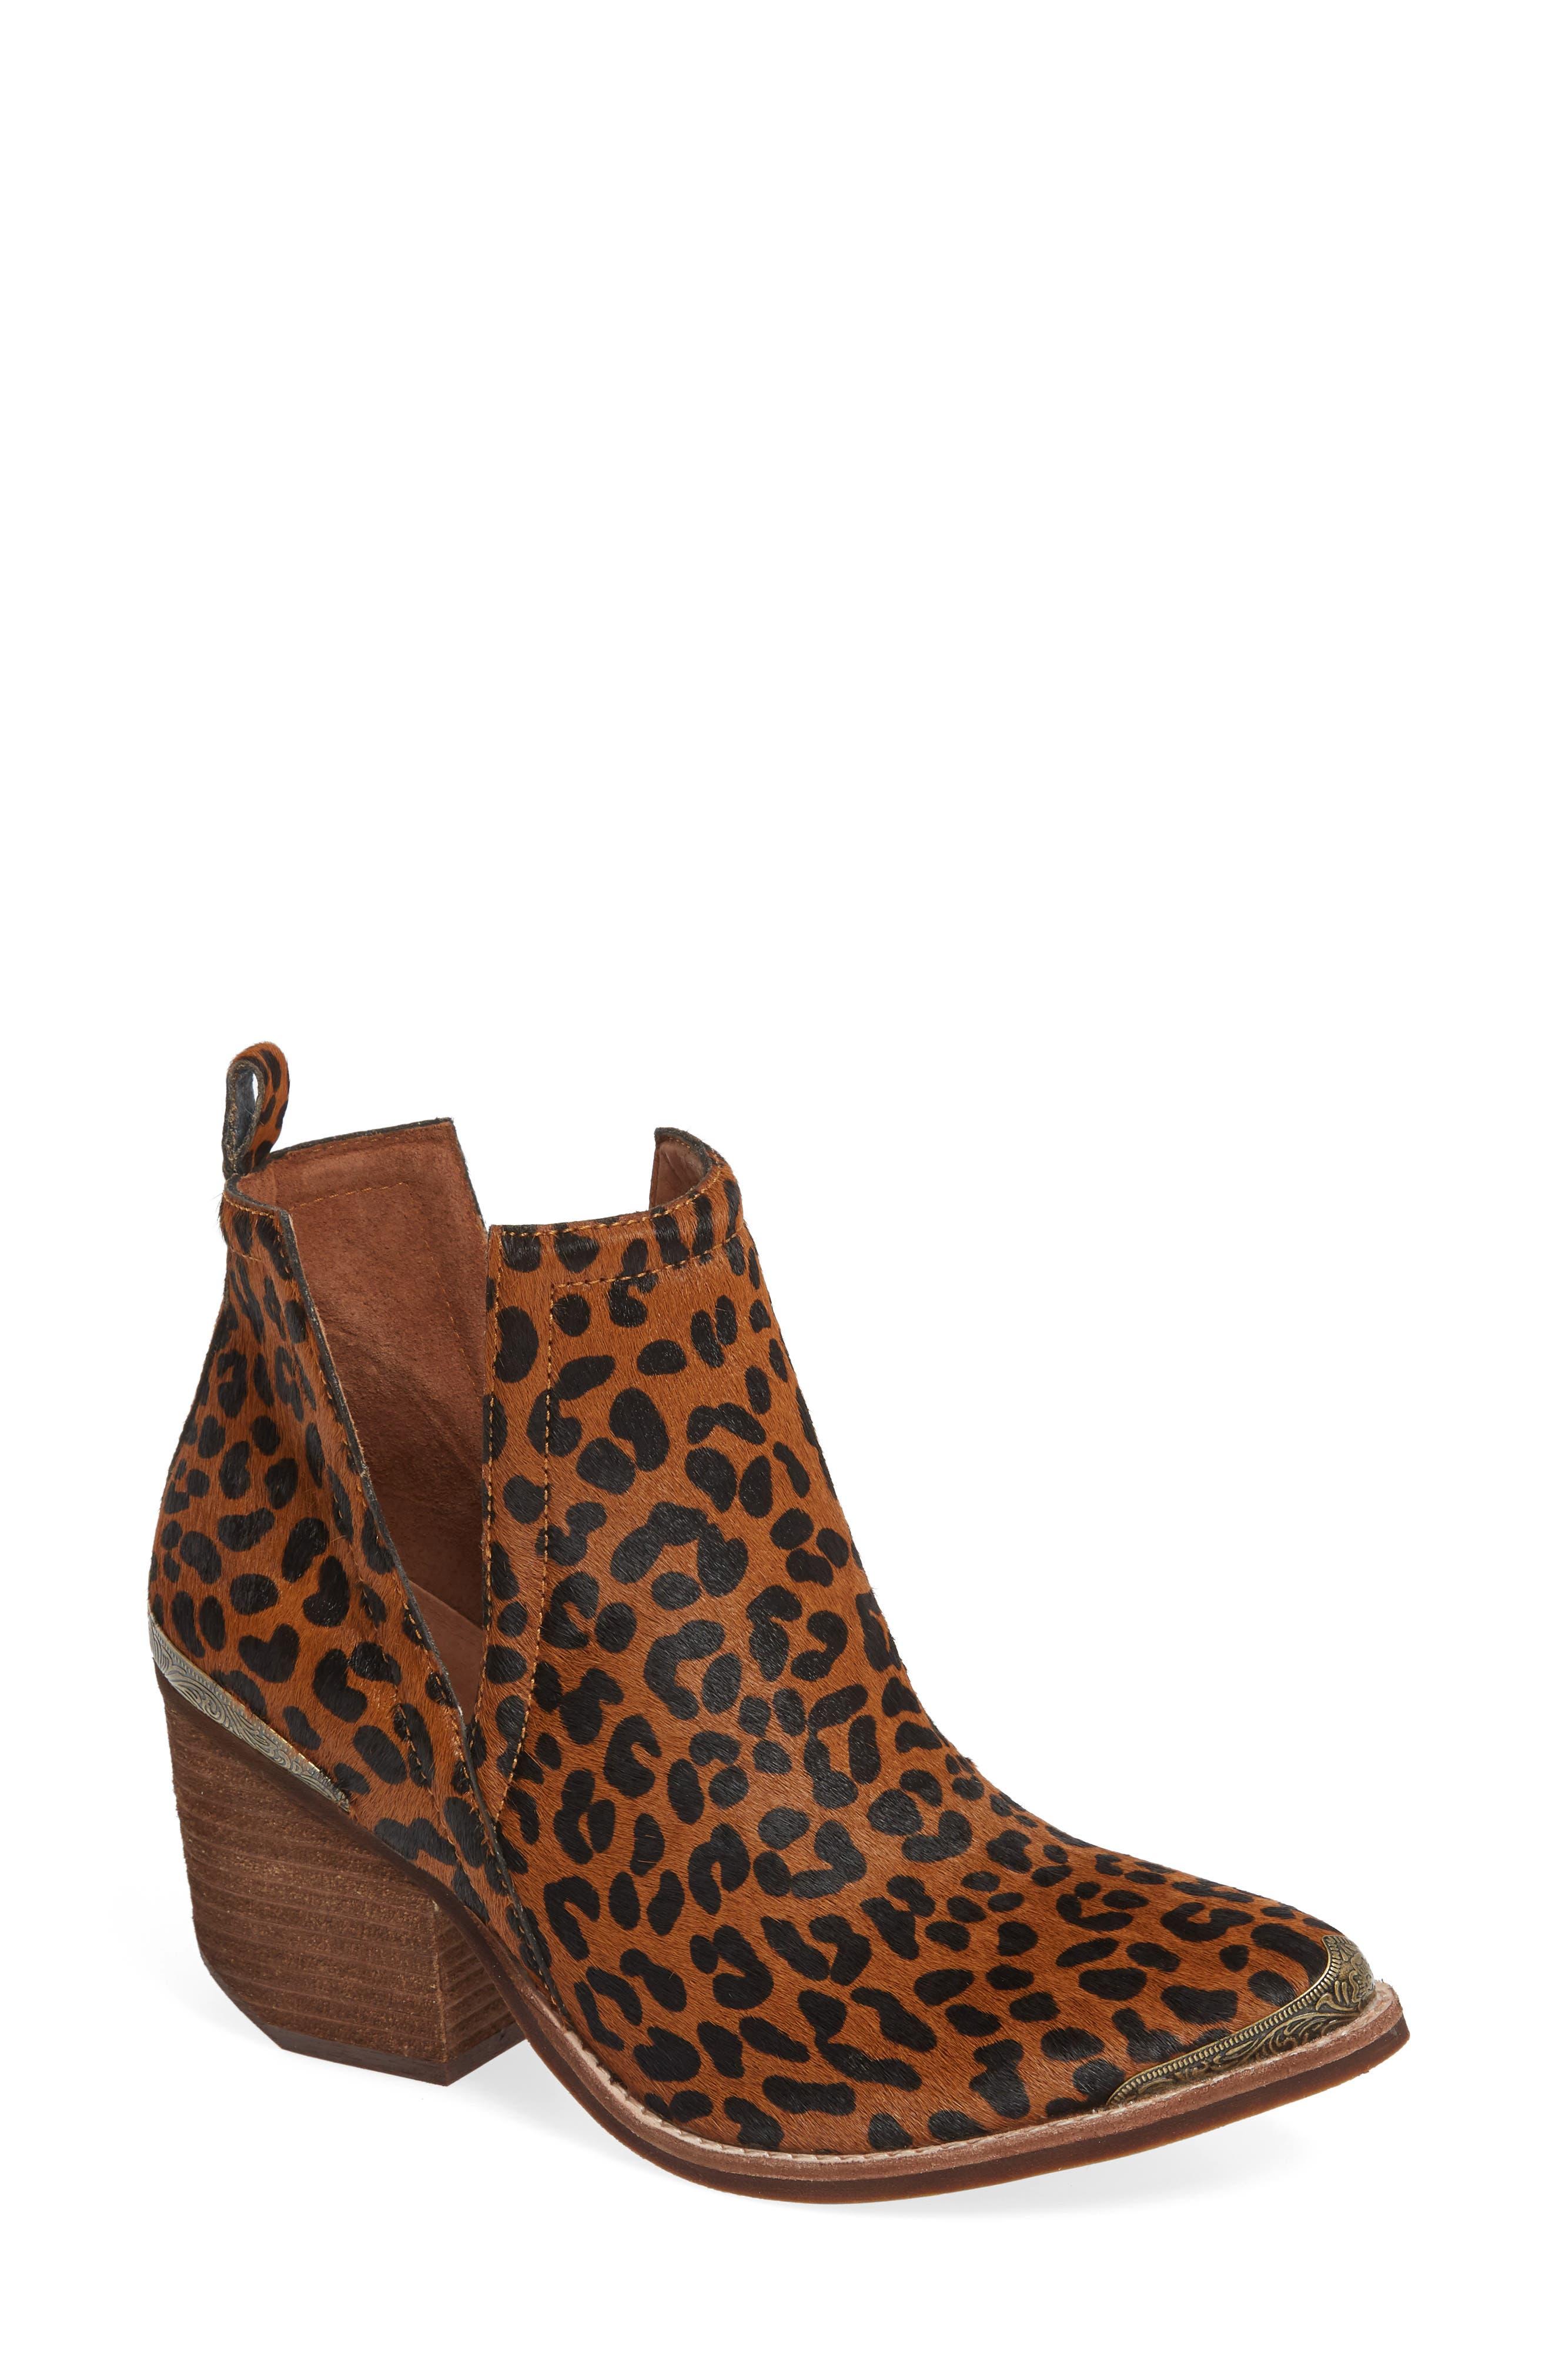 JEFFREY CAMPBELL Cromwell Cutout Genuine Calf Hair Western Boot, Main, color, BROWN CHEETAH CALF HAIR